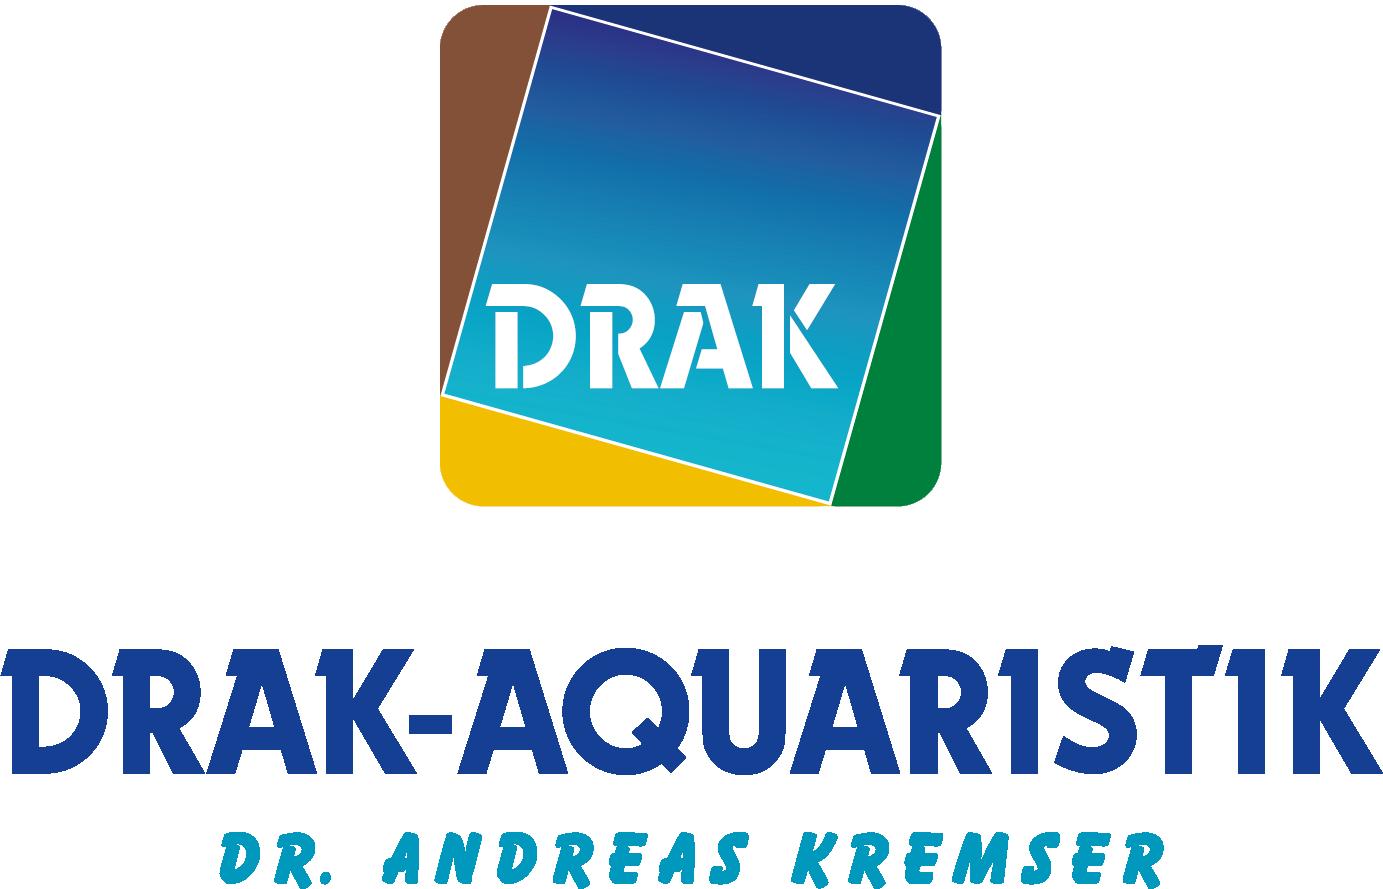 DRAK-Aquaristik Dr. Andreas Kremser